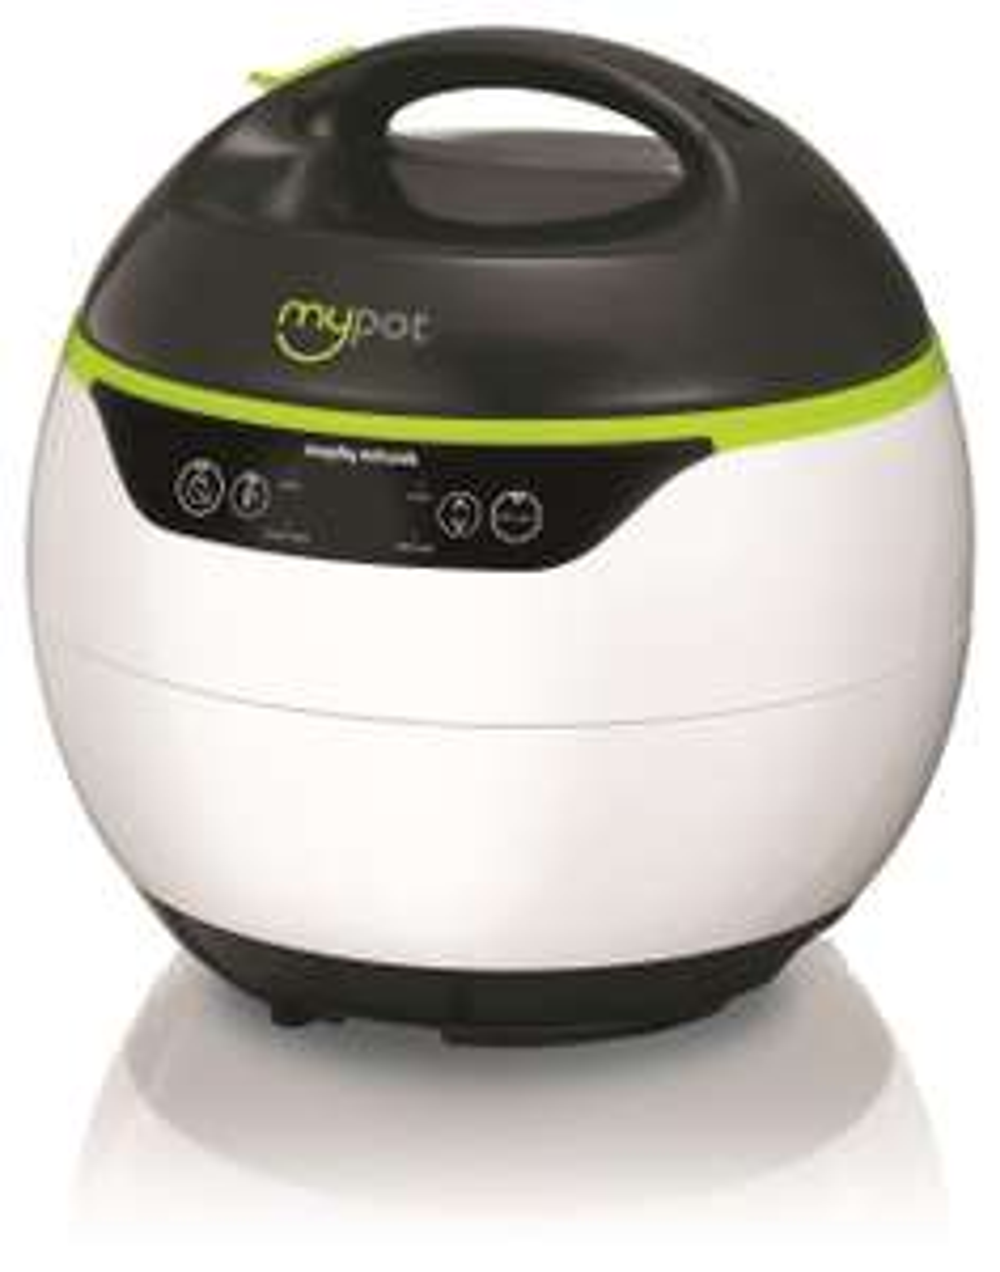 morphy richards mypot pressure cooker £55.99 Morphy Richards